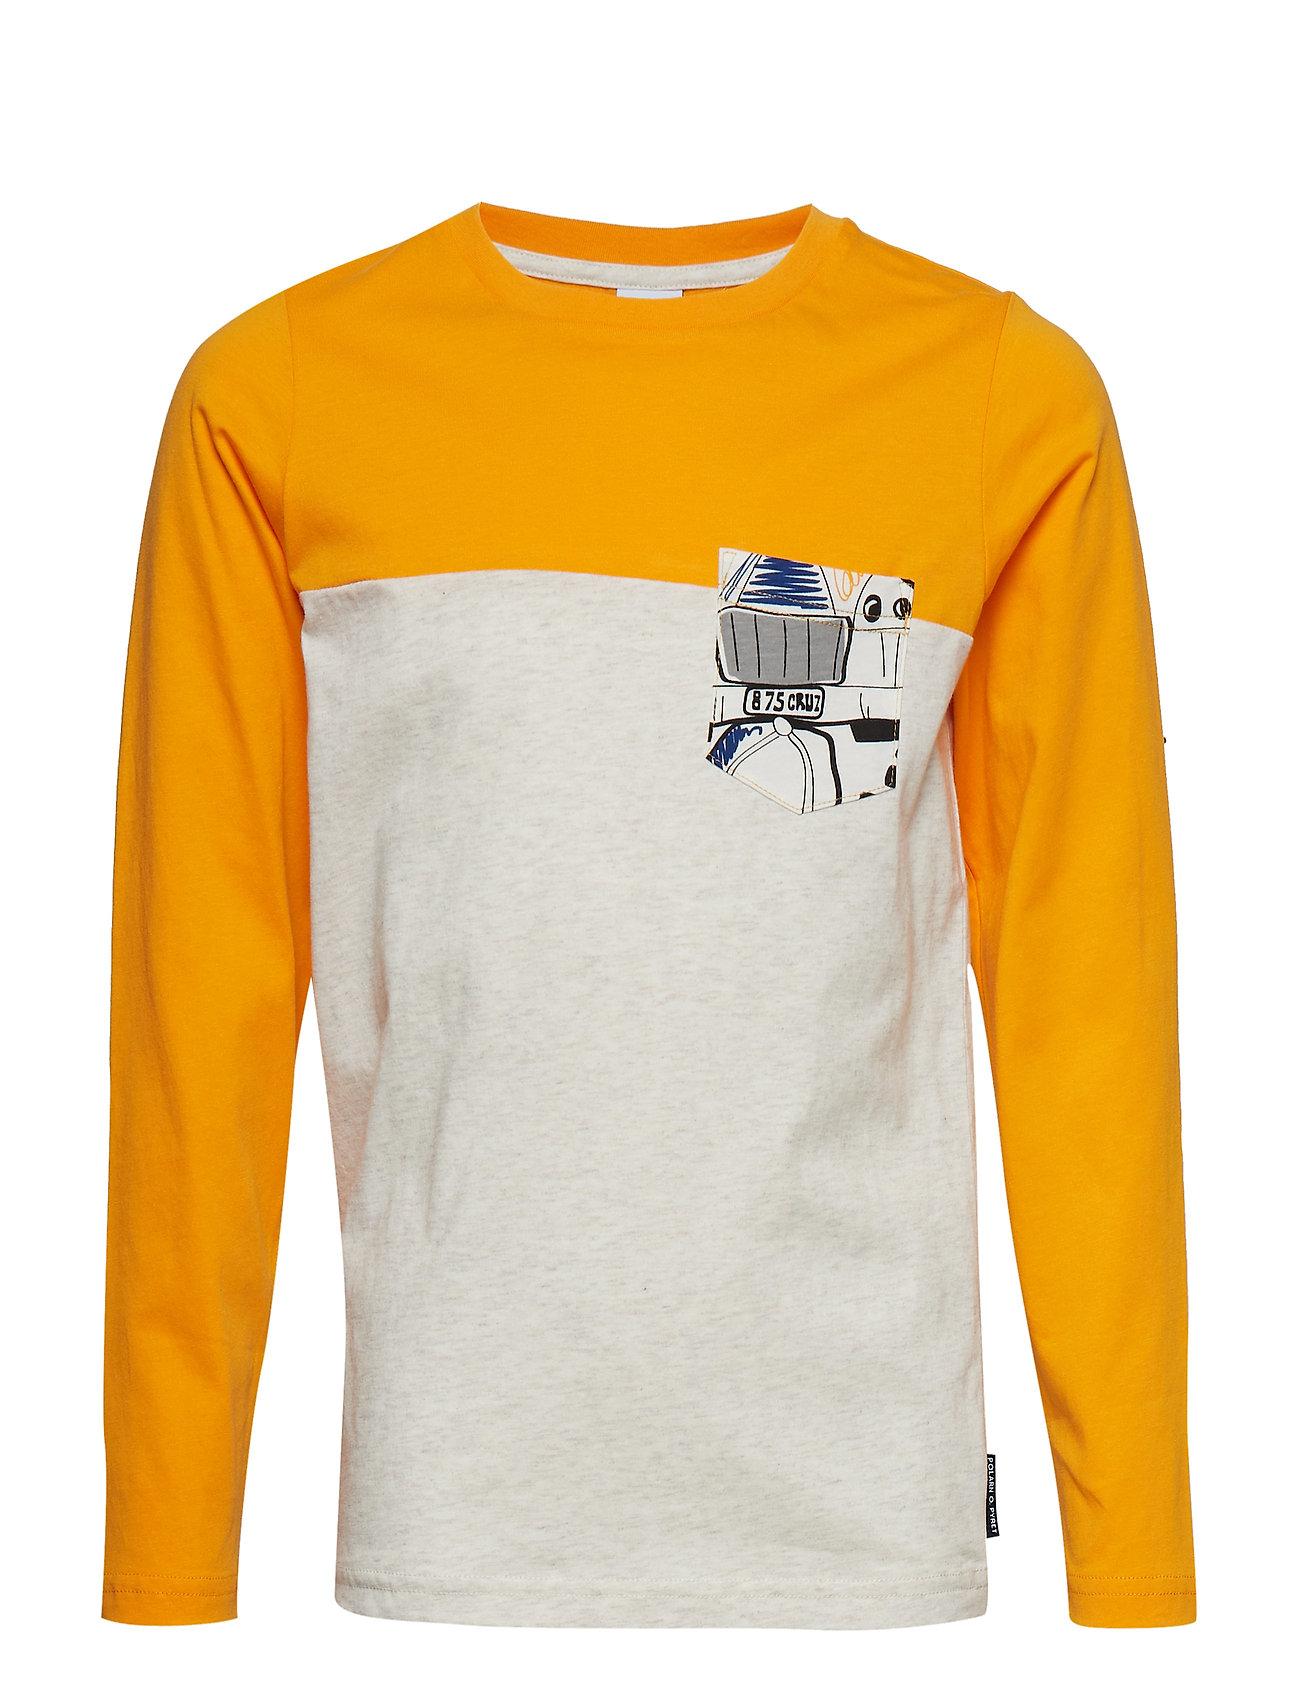 Polarn O. Pyret T-shirt long sleeve School